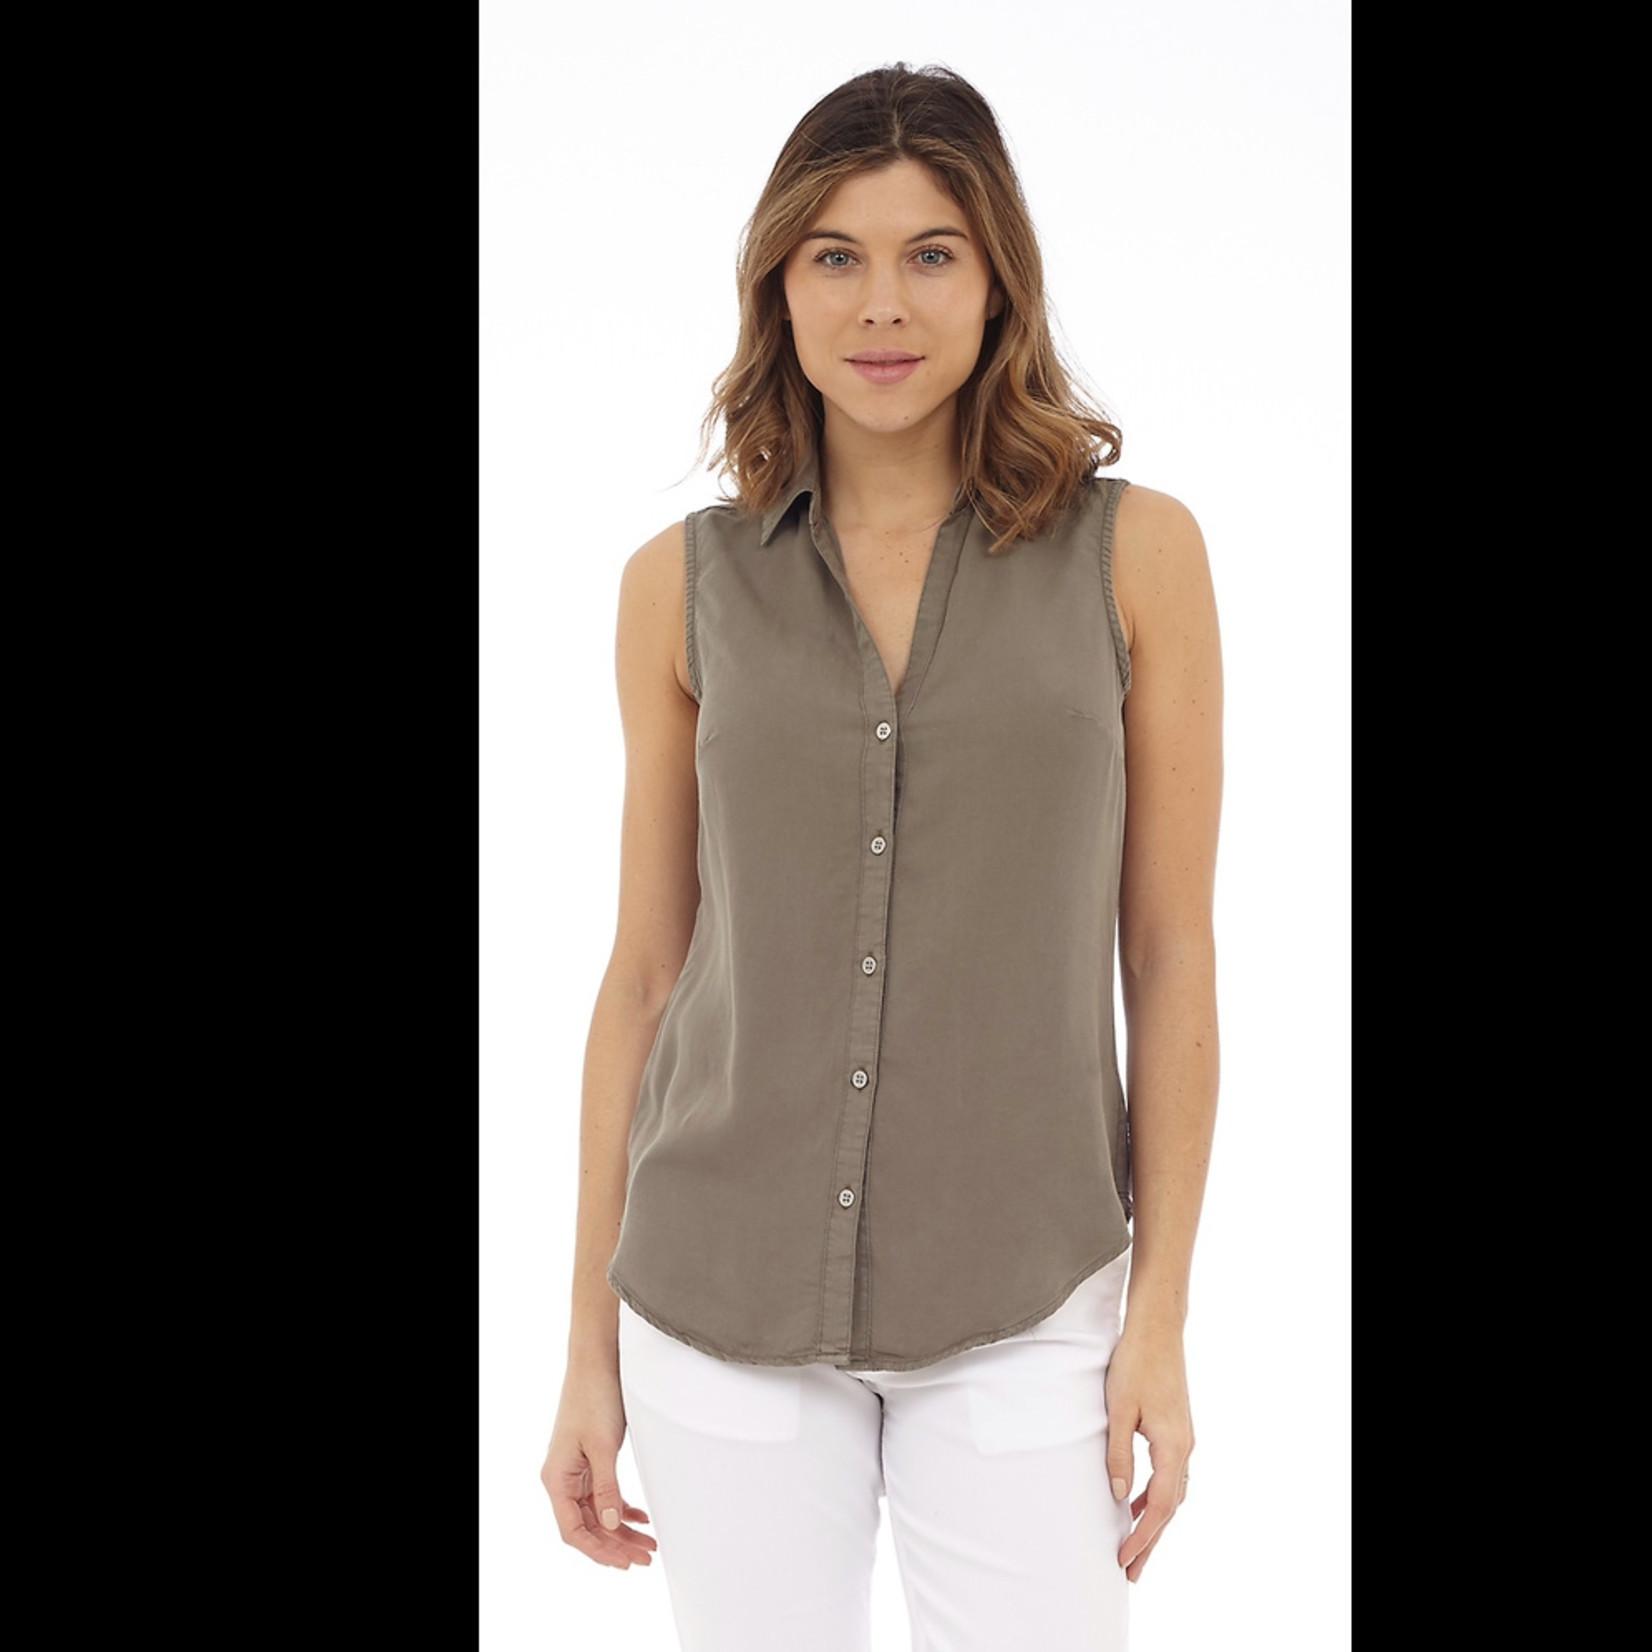 DKR & Company Sleeveless V-Neck Button Up Top CH-ATK